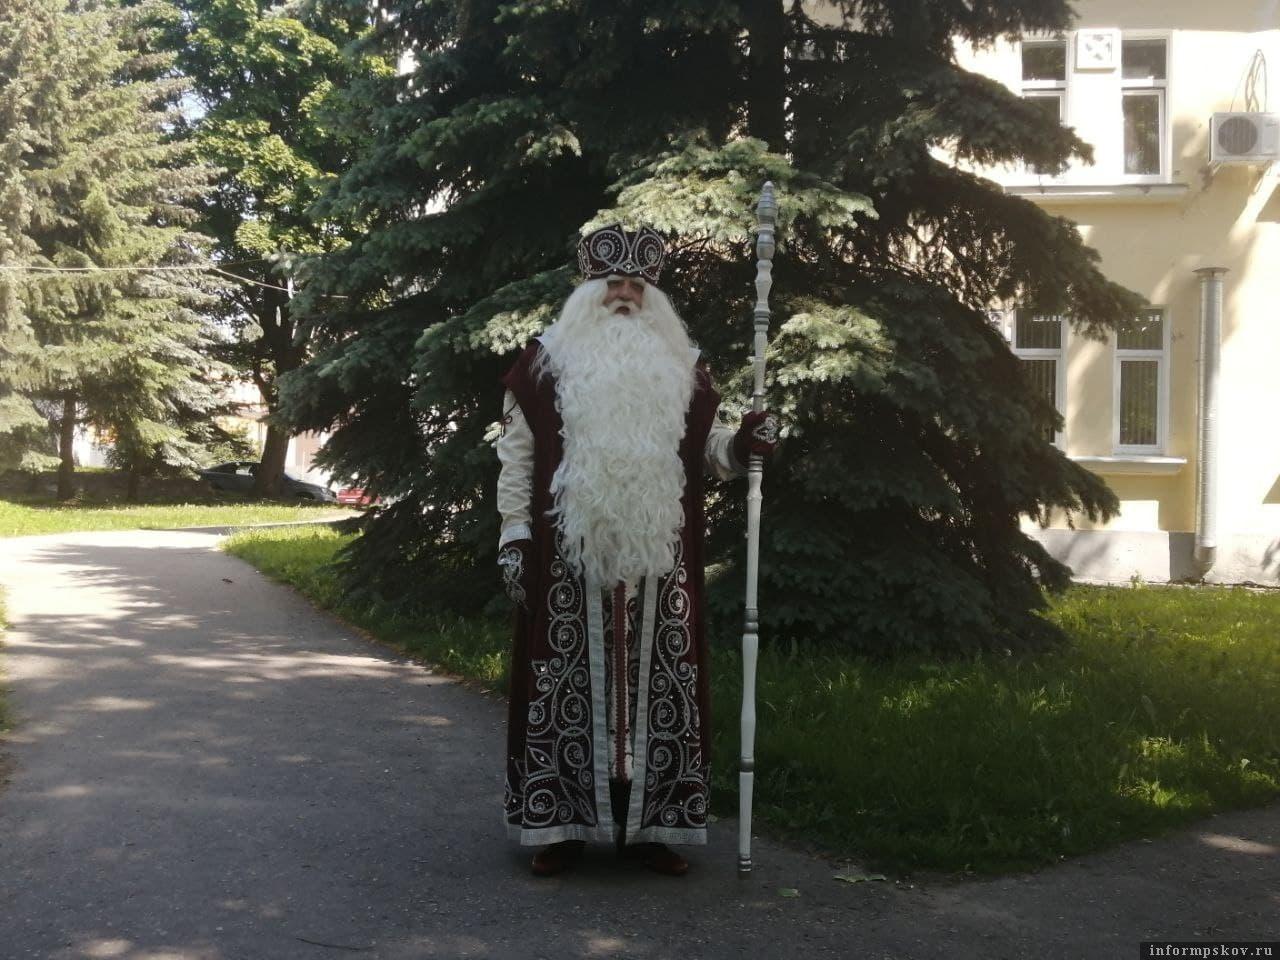 Дед Мороз встретился с депутатами и журналистами. Фото ПАИ.